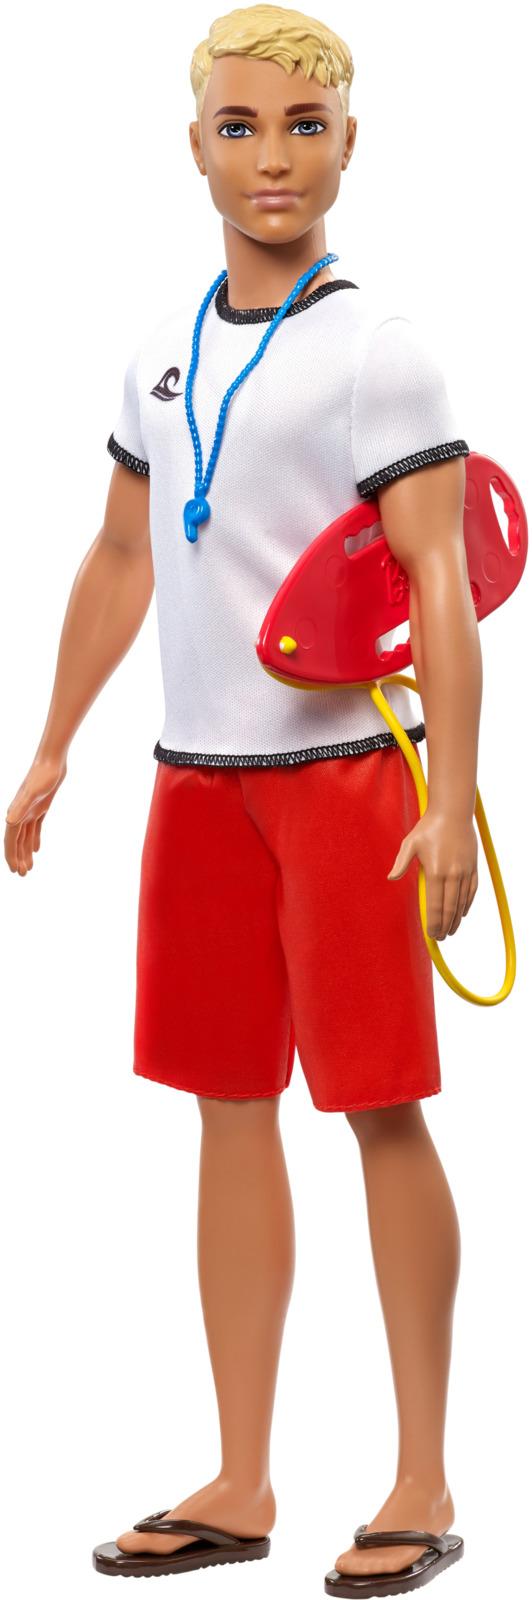 "Кукла Barbie ""Кем быть Кен"", FXP01_FXP04"